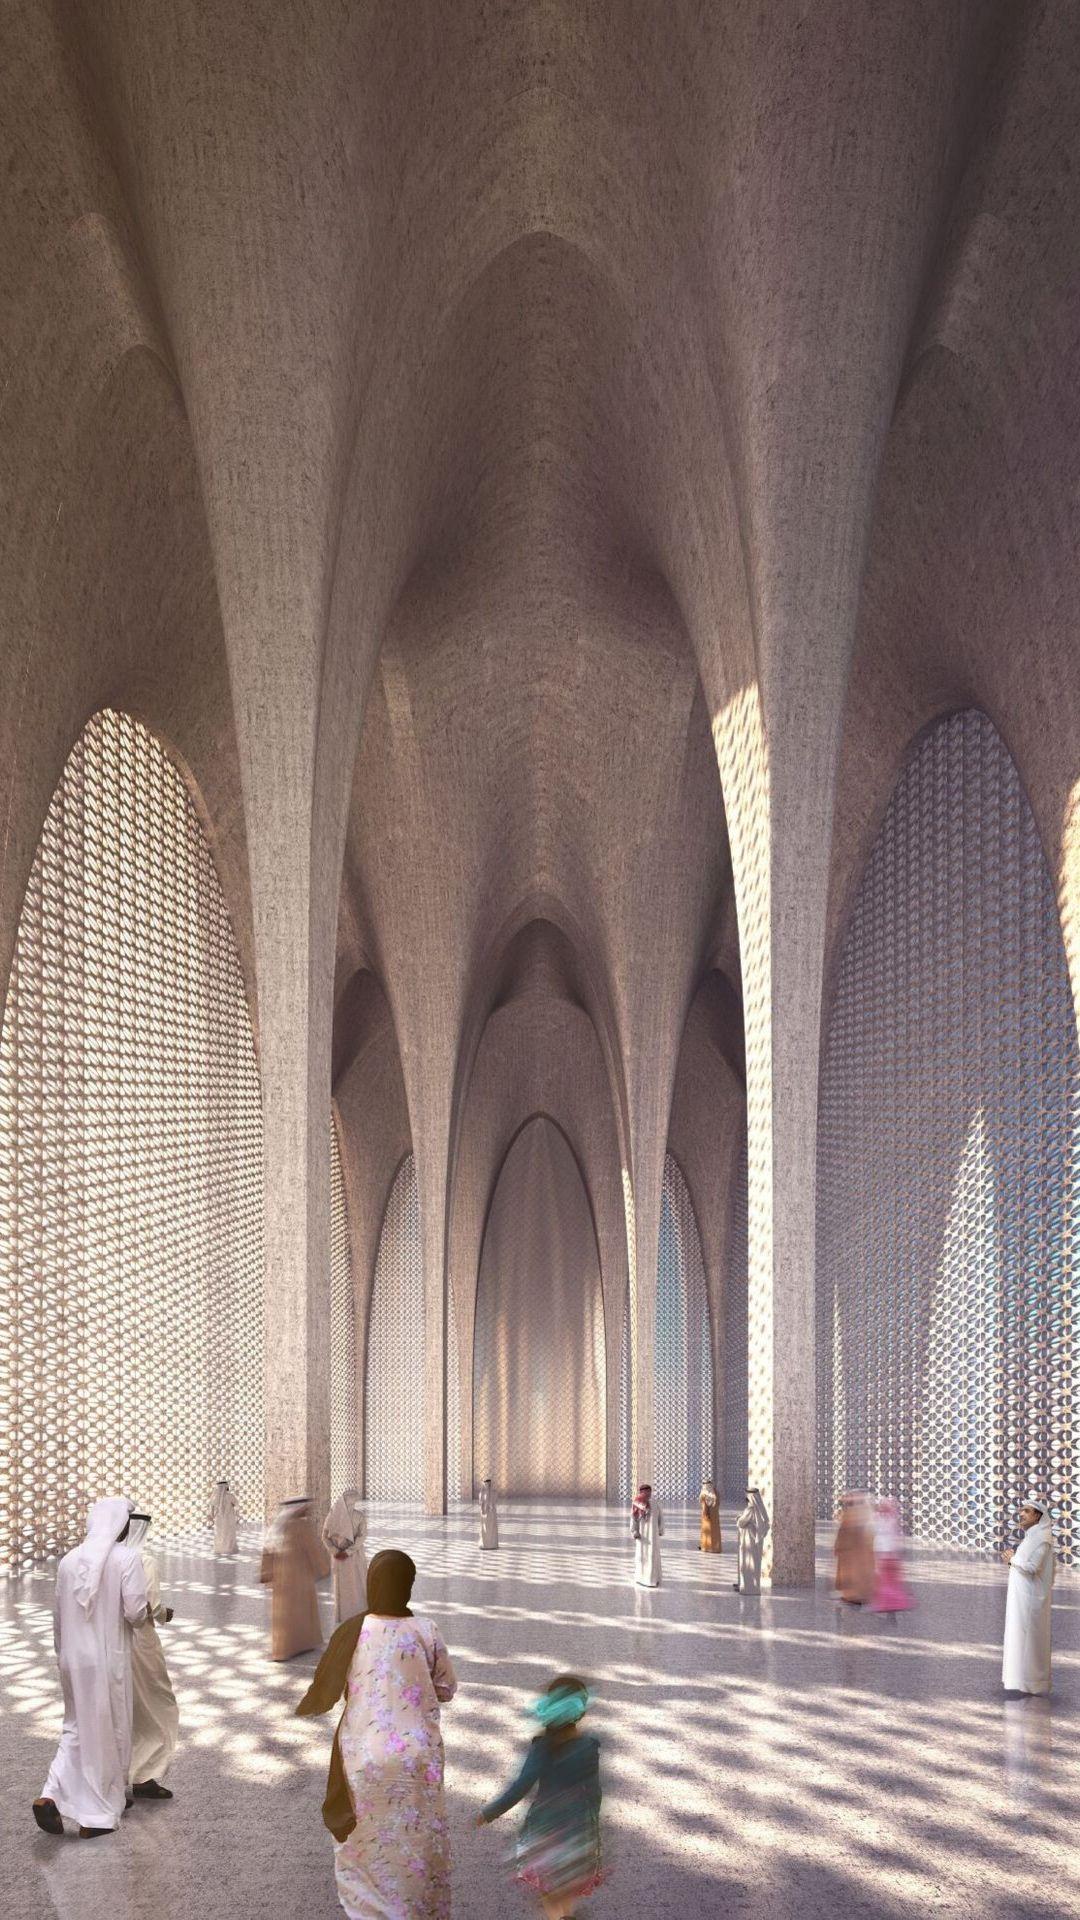 Abrahamic-Family-House-Mosque-interior-Adjaye-Associates